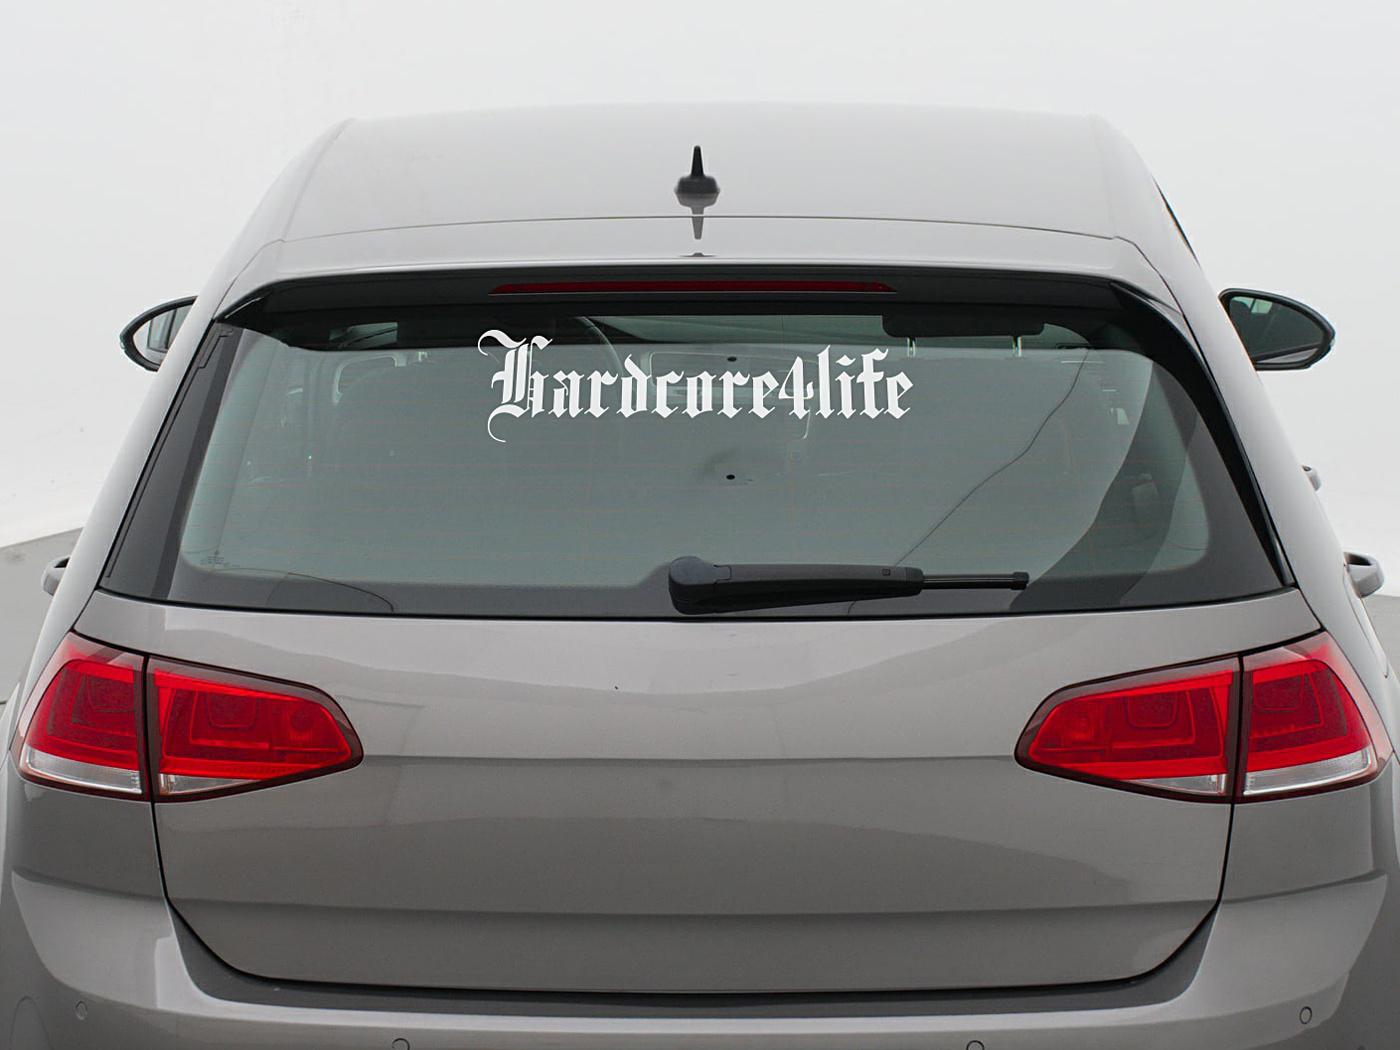 HARDCORE4LIFE CAR STICKER